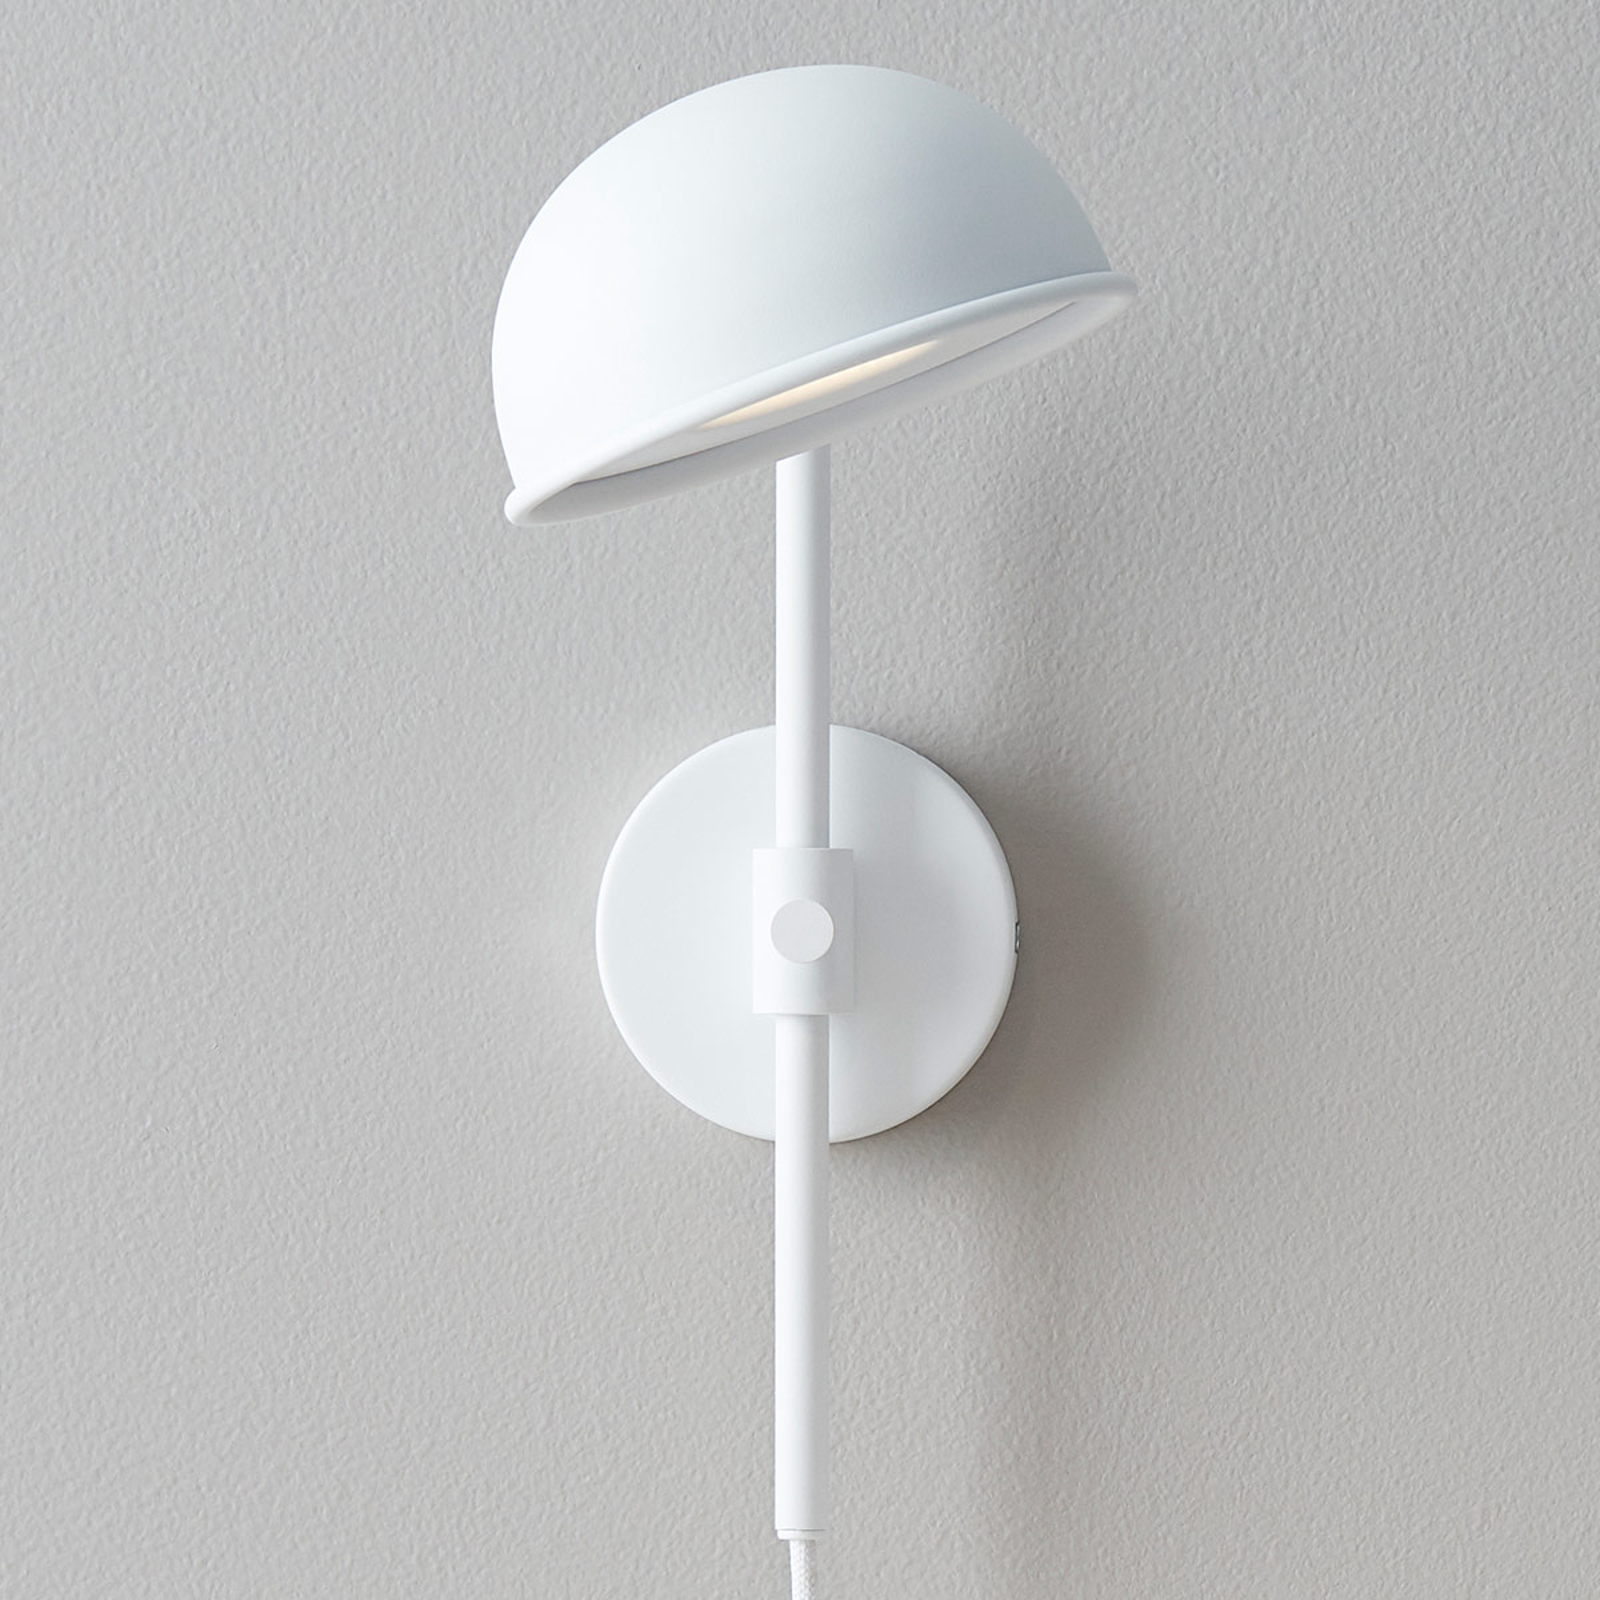 LED-Wandlampe Bolero mit Dimmer, weiß